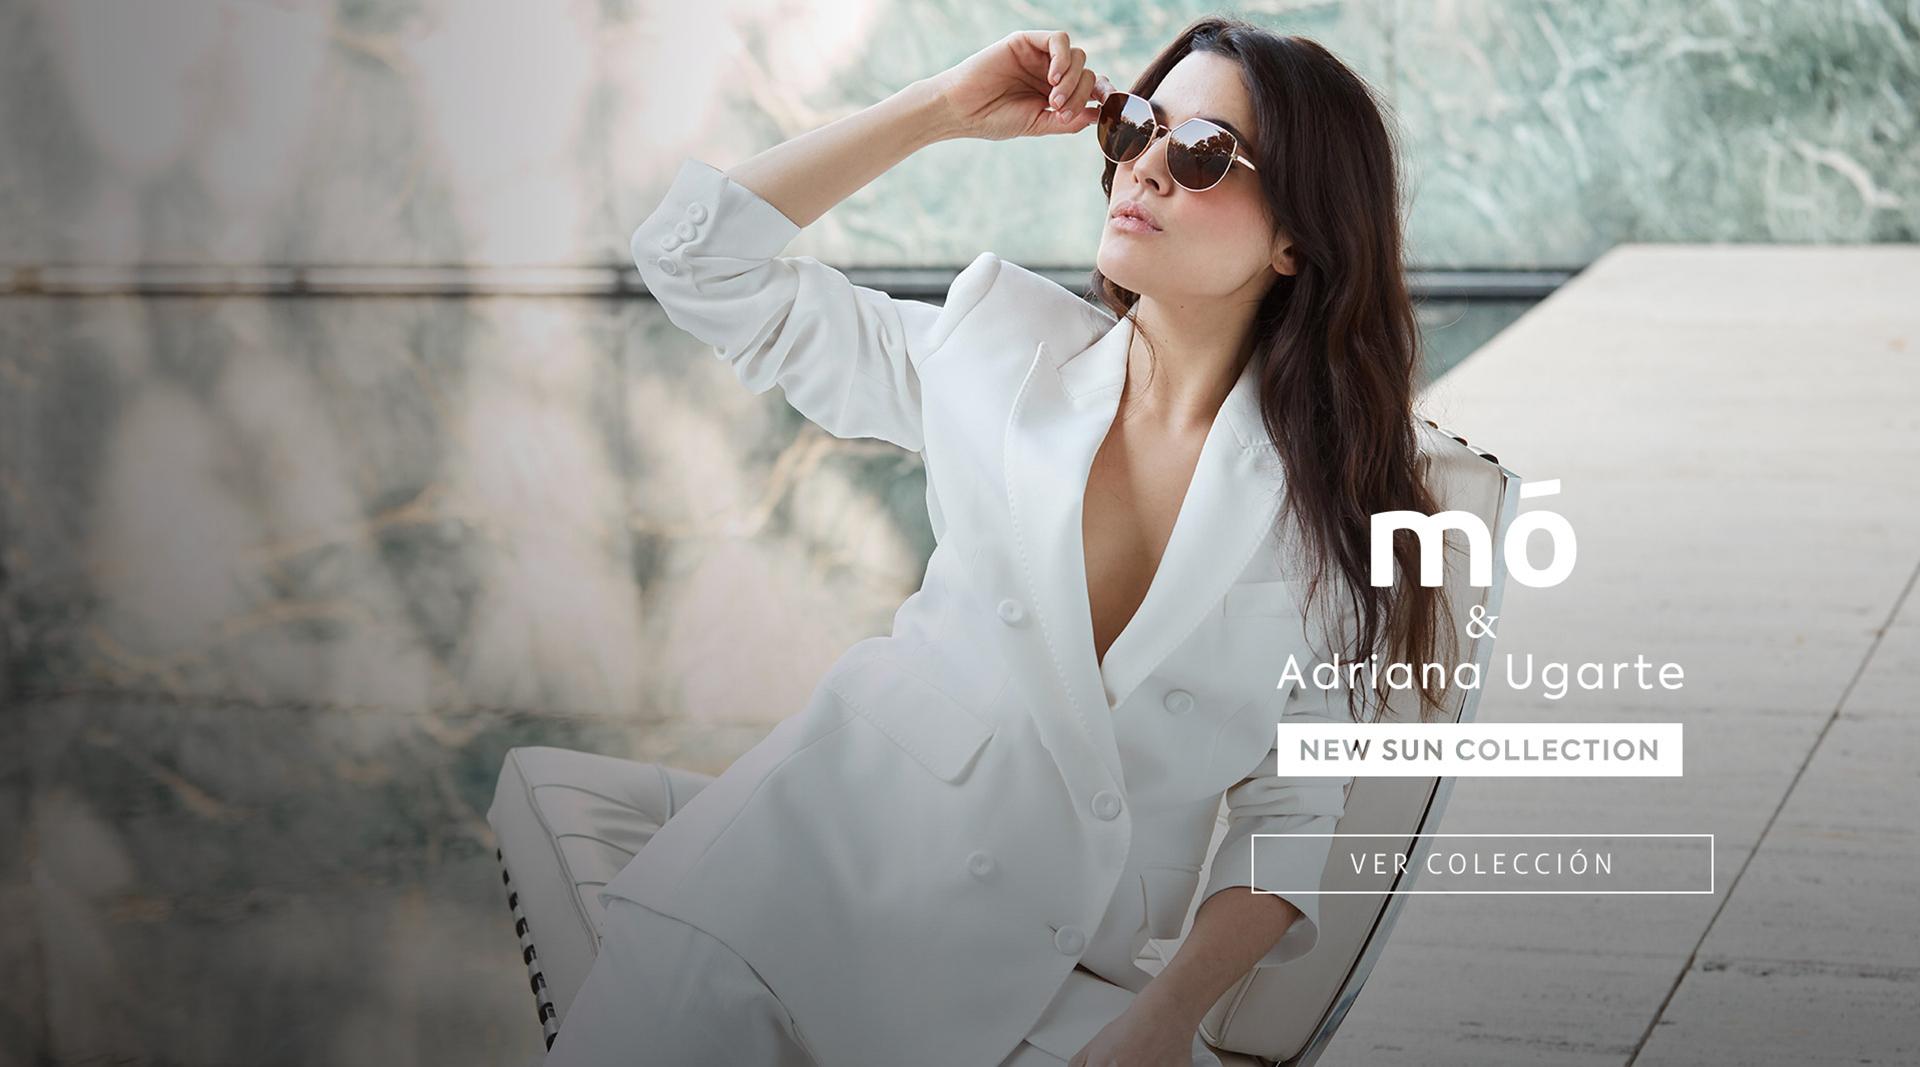 Gafas de Sol Adriana Ugarte